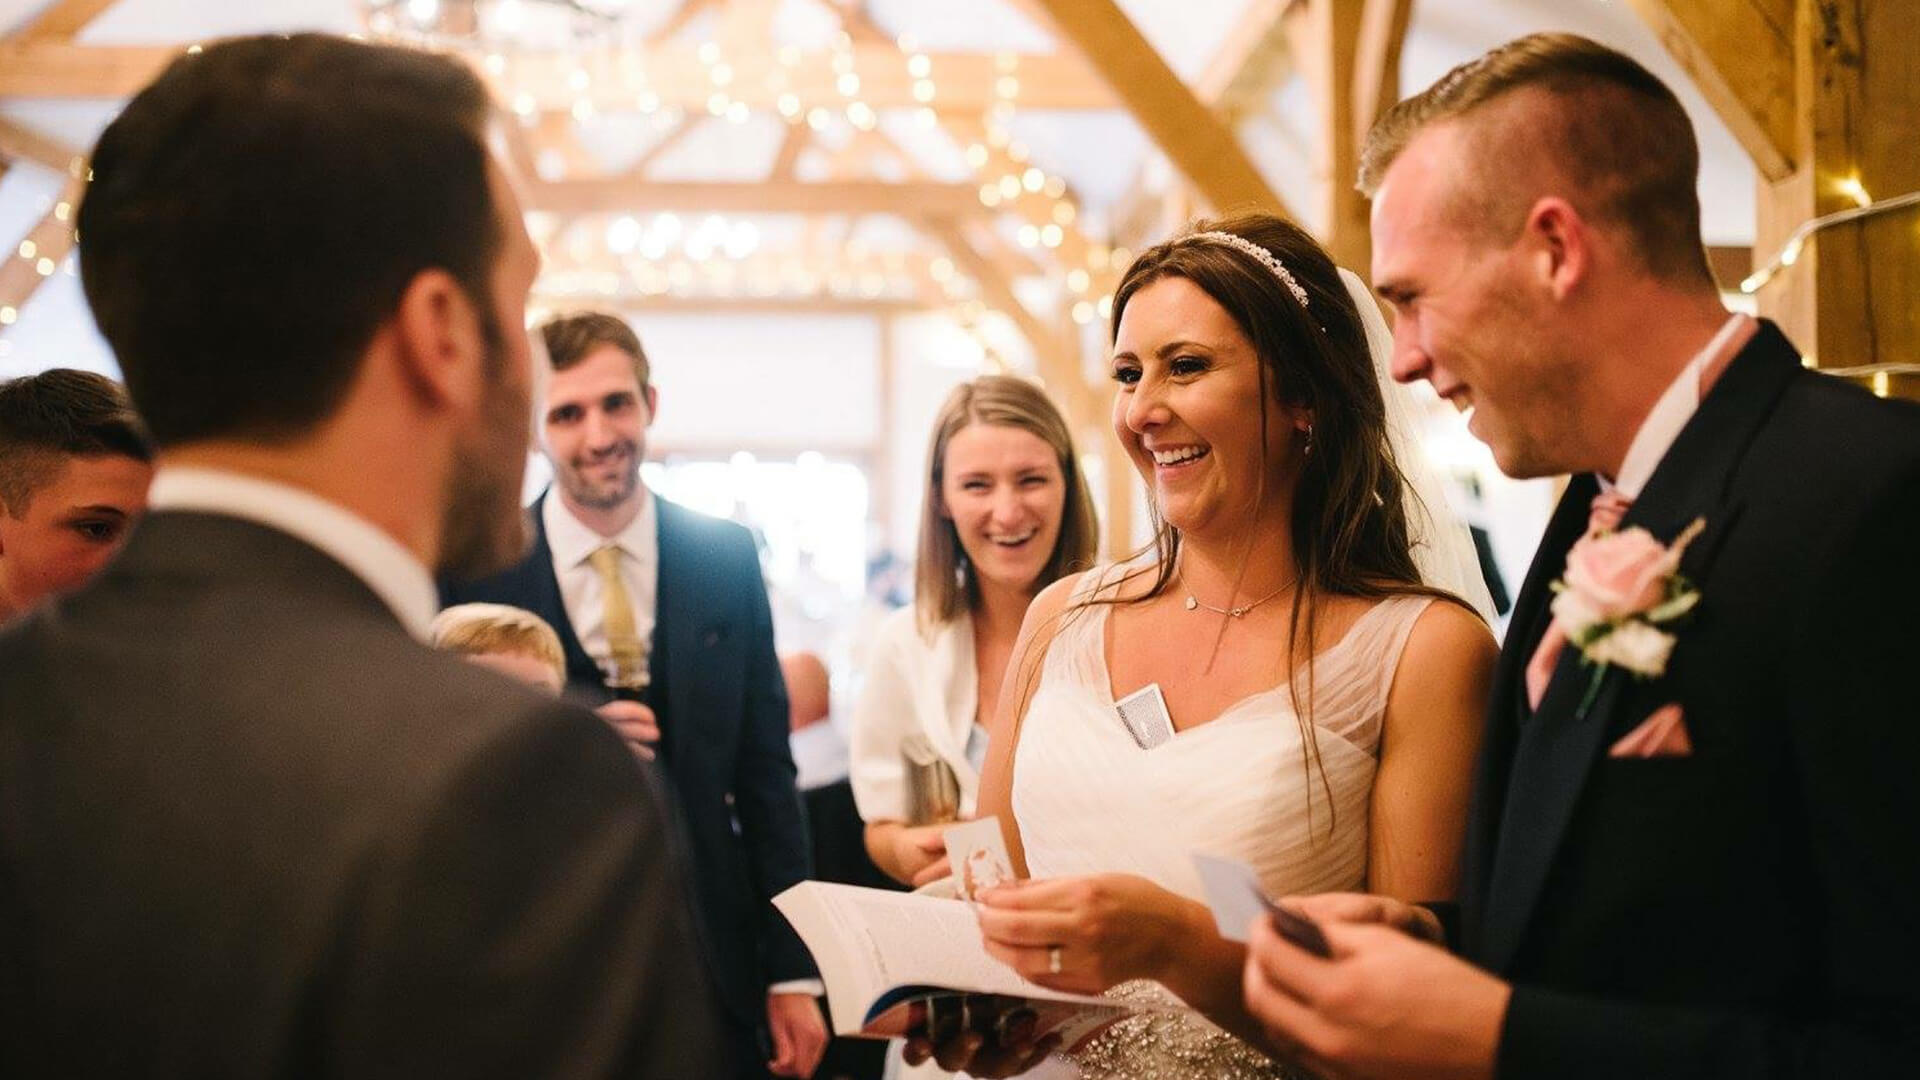 bride groom and friends having fun with Aaron Calvert manchester Wedding magician